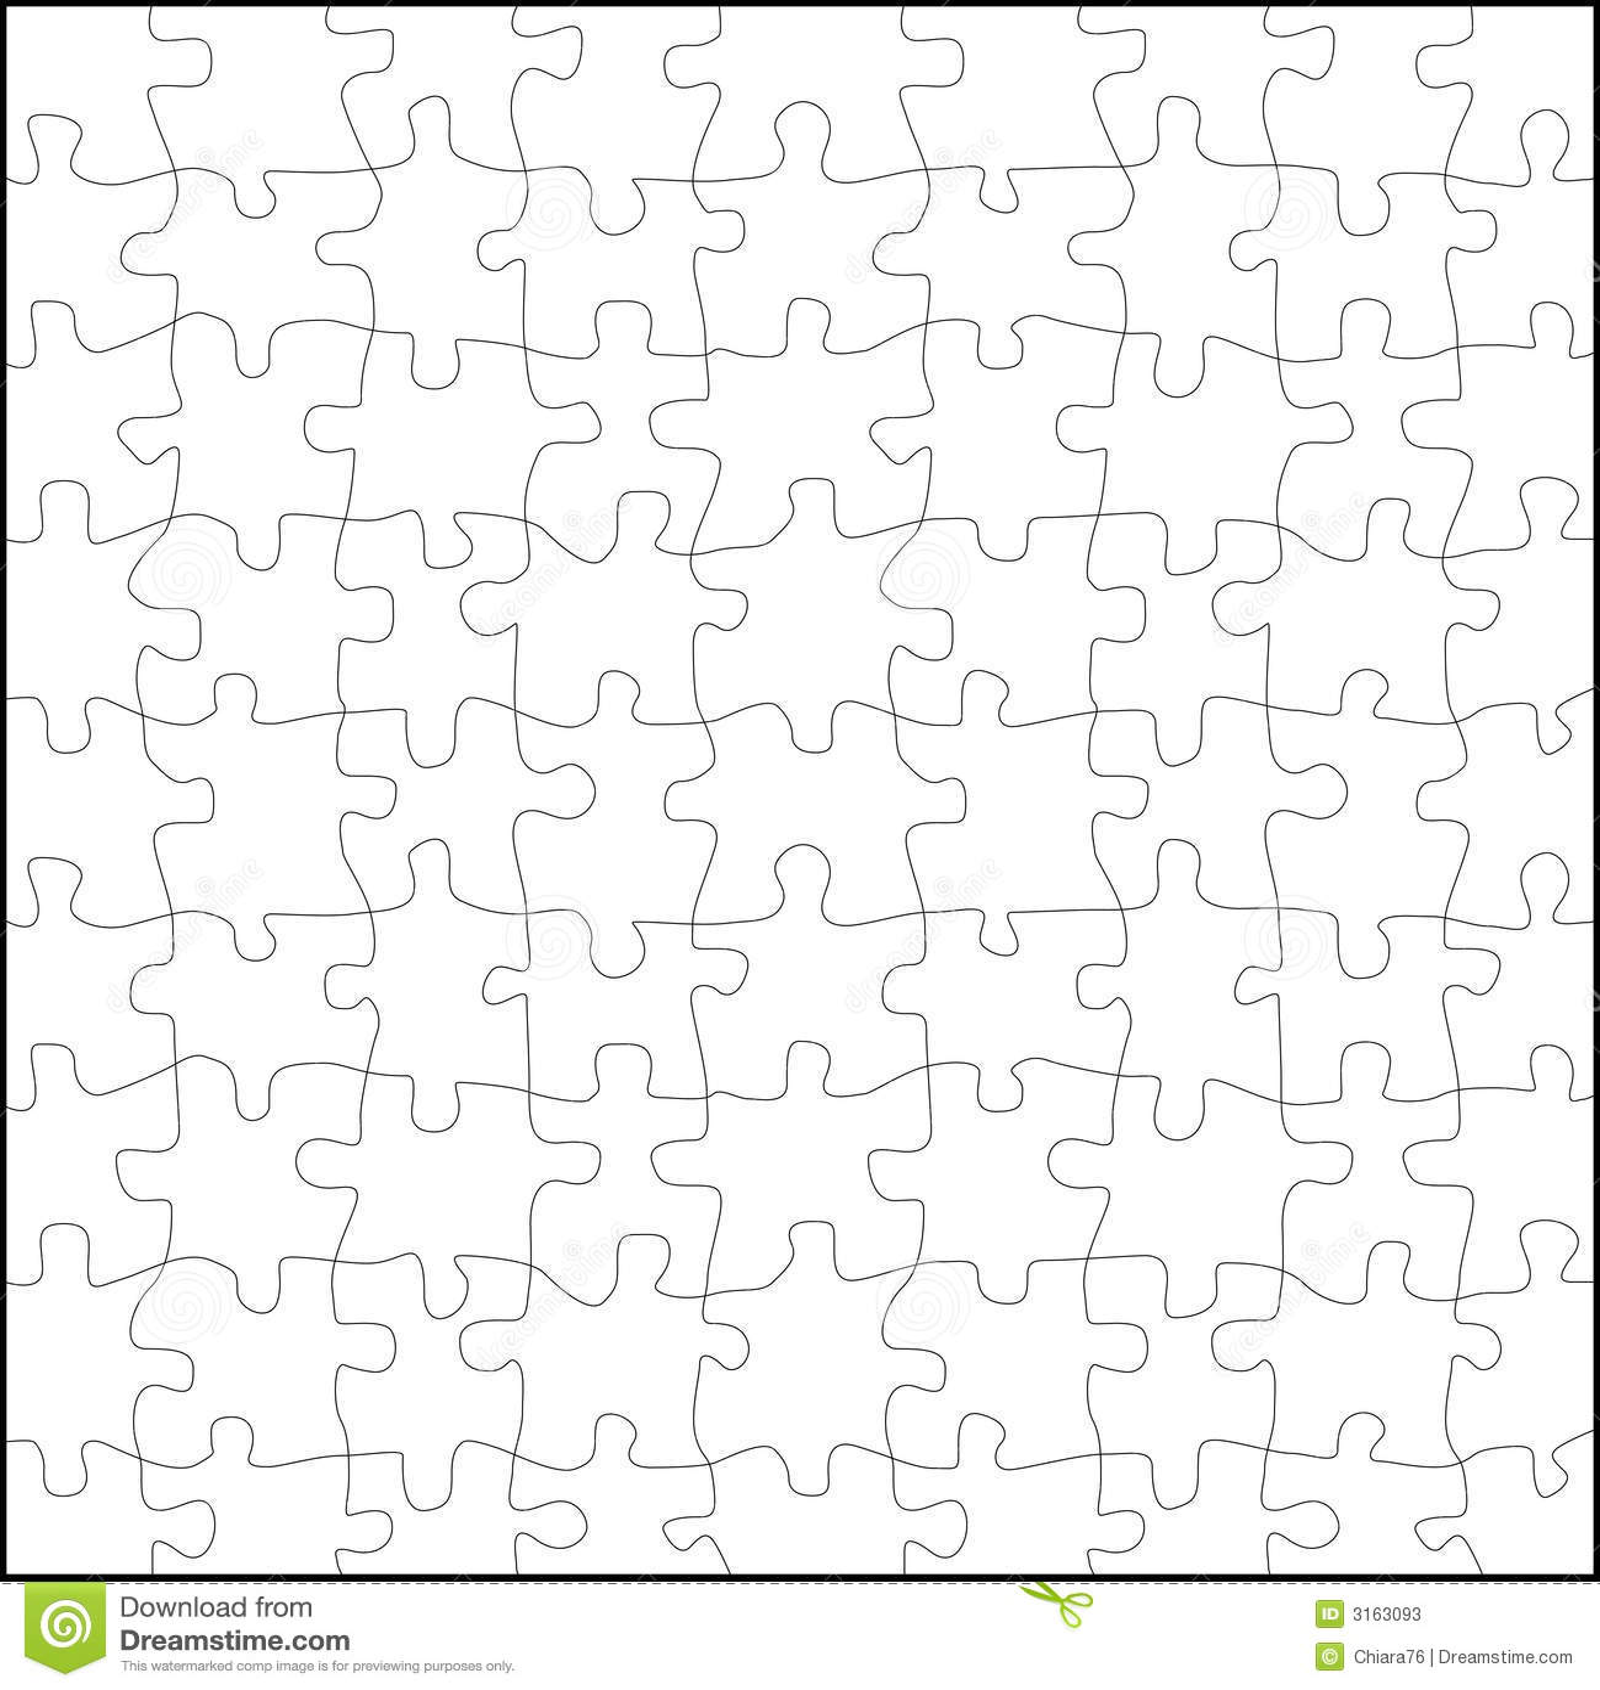 Puzzle Vector Stock Photos - Image: 3163093